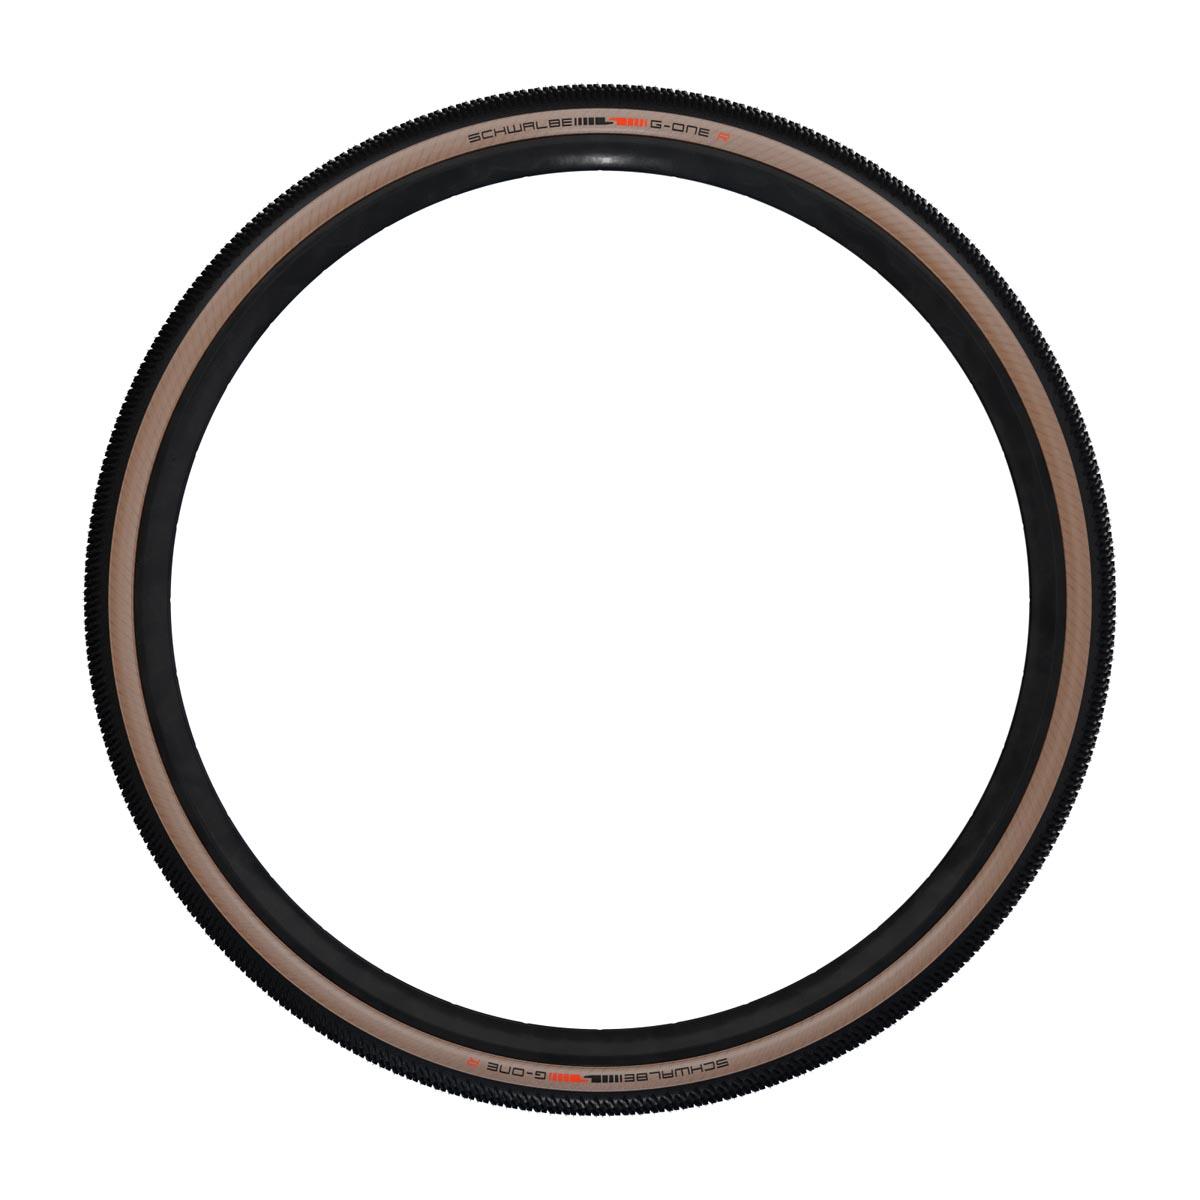 Schwalbe G-One R gravel tire